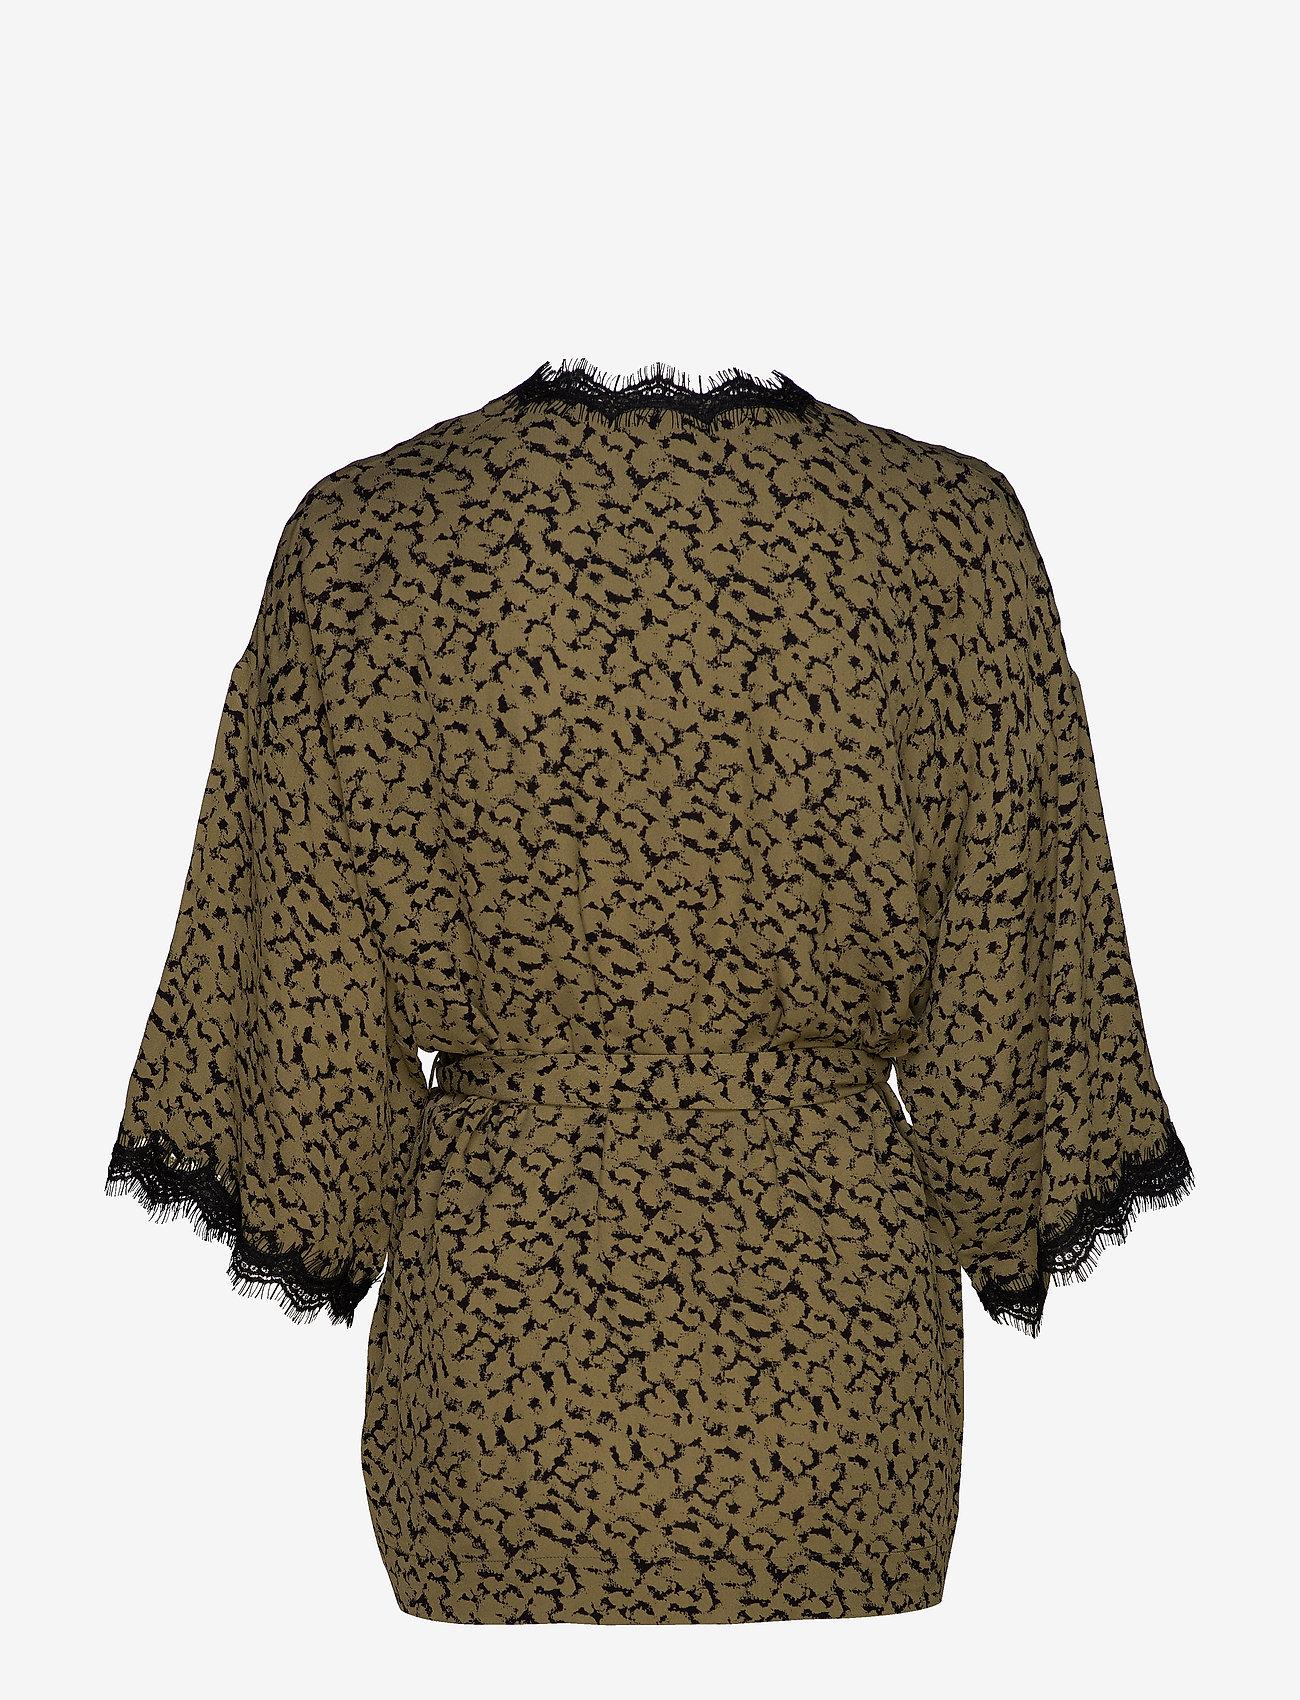 Rosemunde - Jacket 3/4 s - kimona - green blurred blossom print - 1